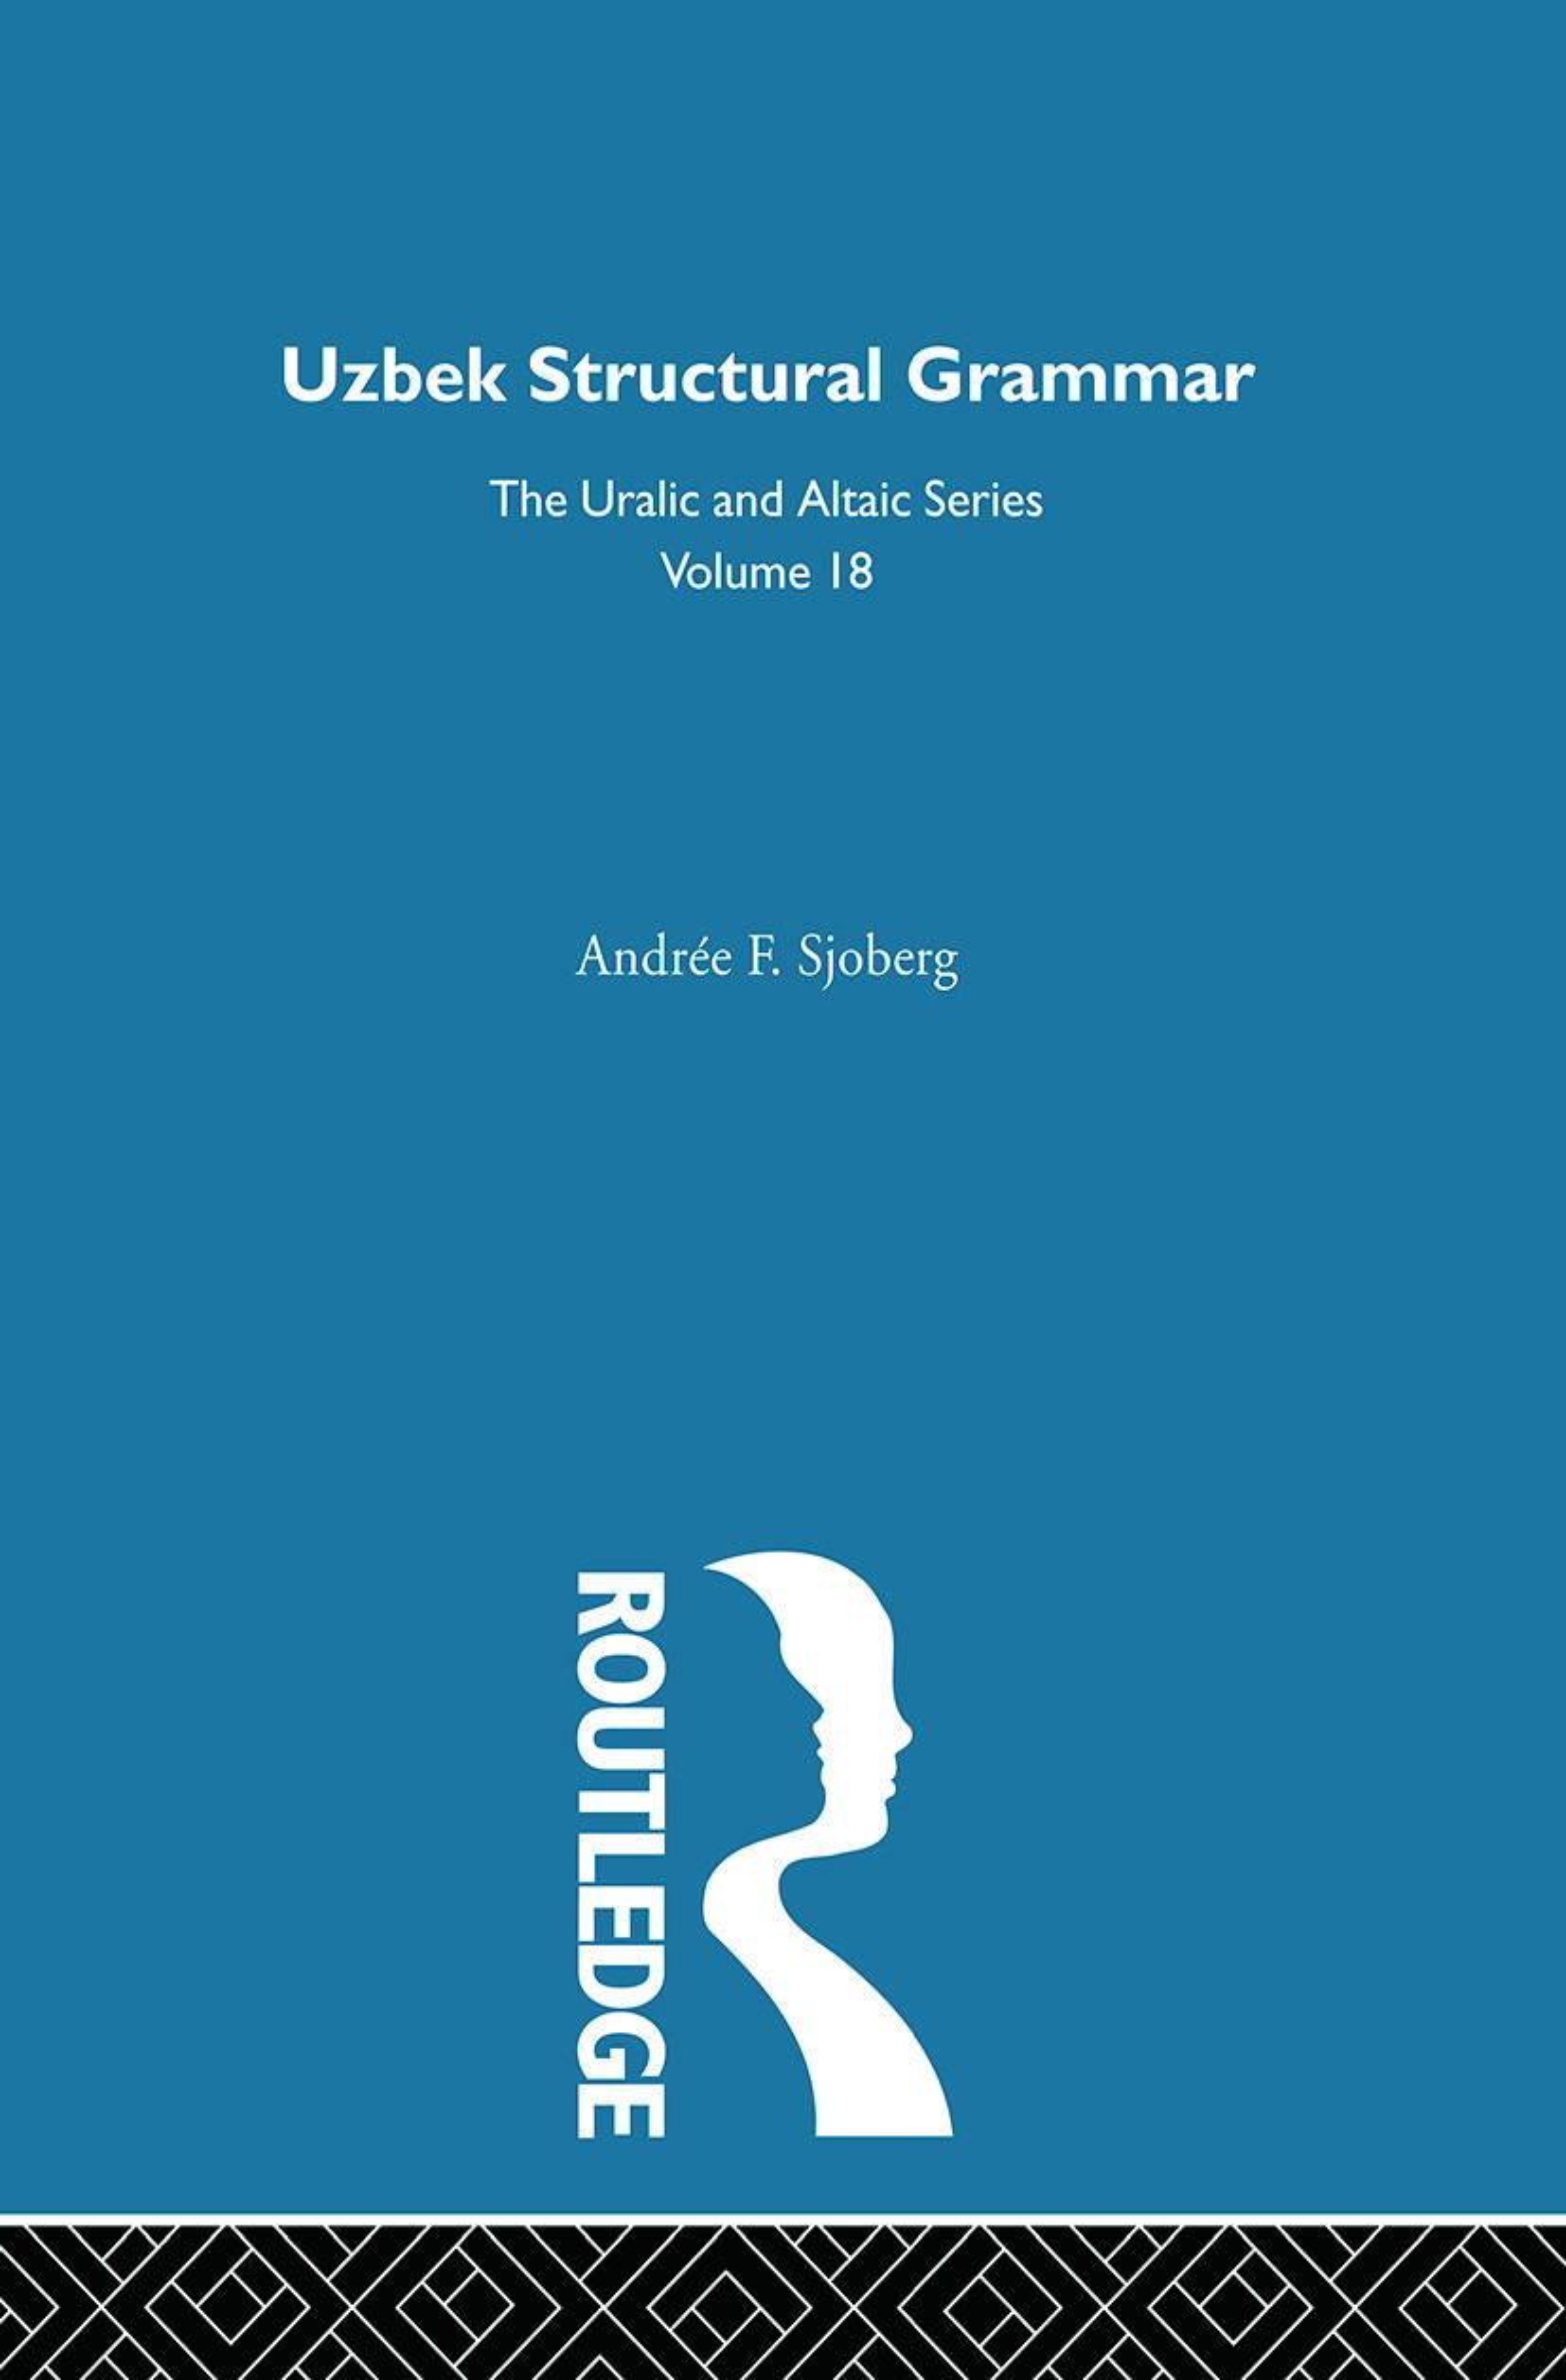 Uzbek Structural Grammar